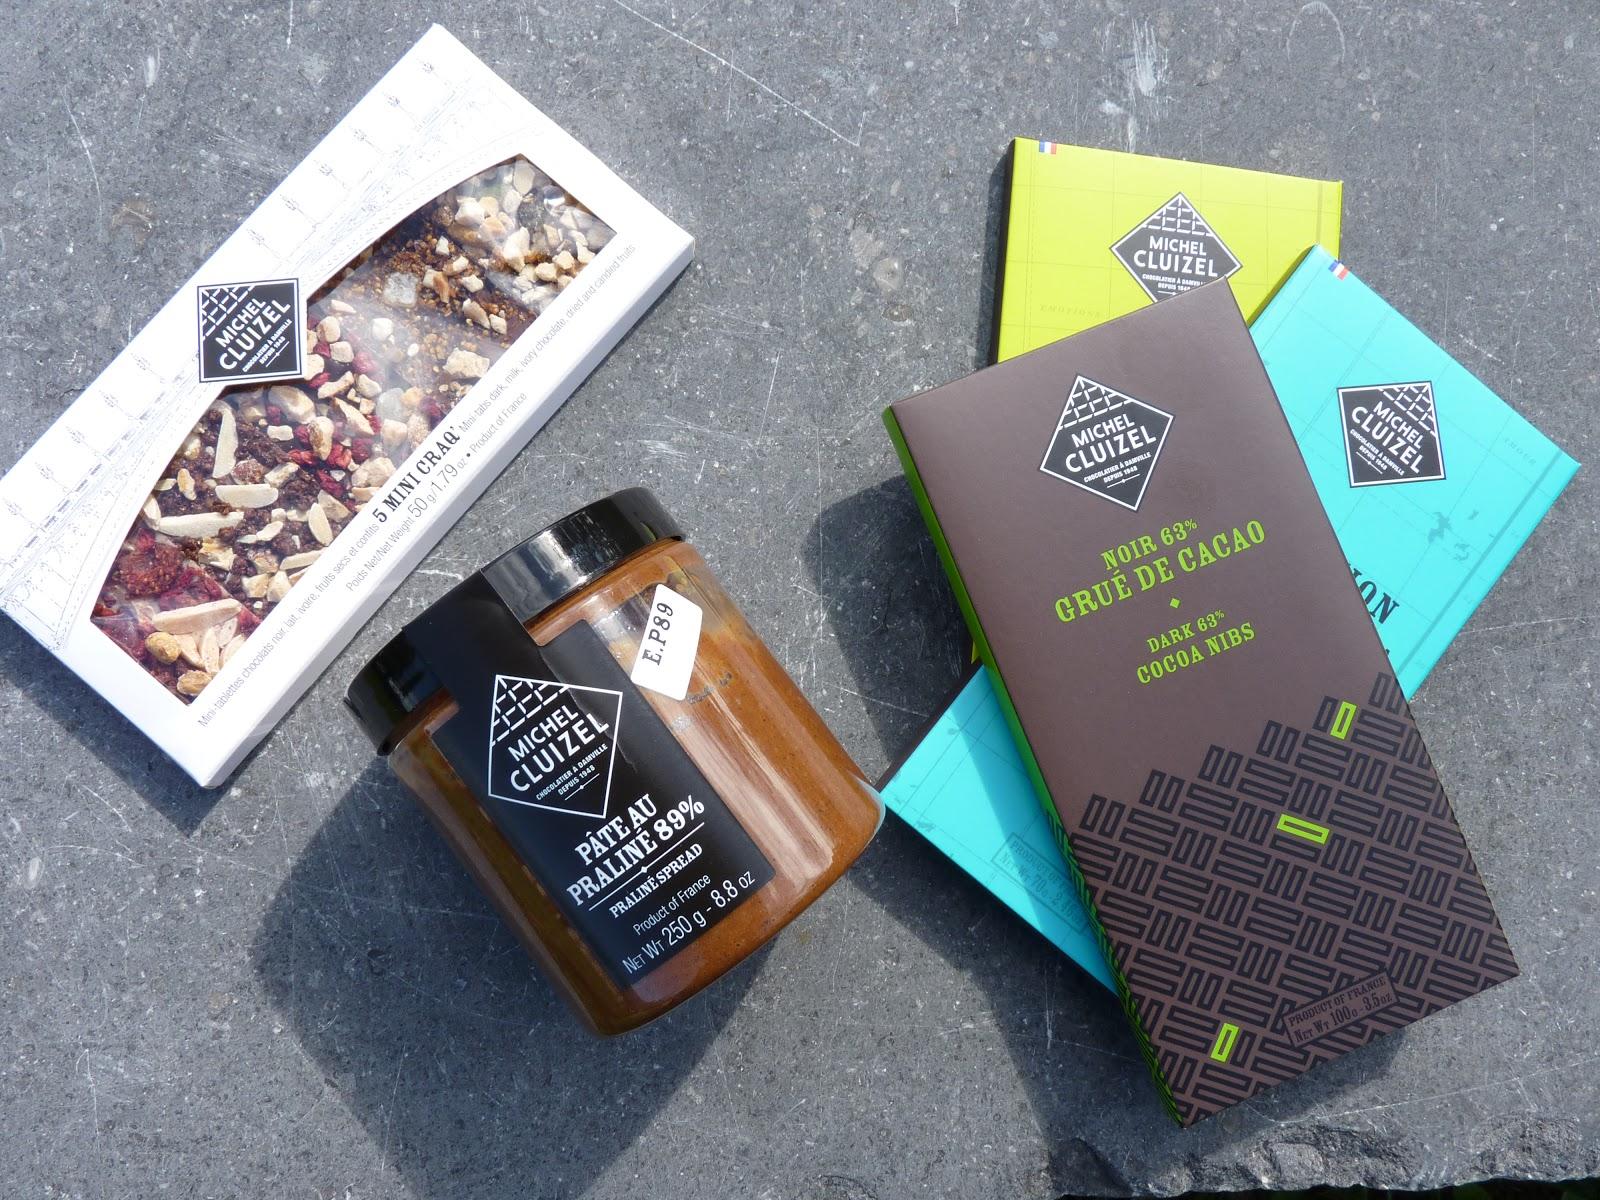 Chocolaterie Cluizel, une visite gourmande